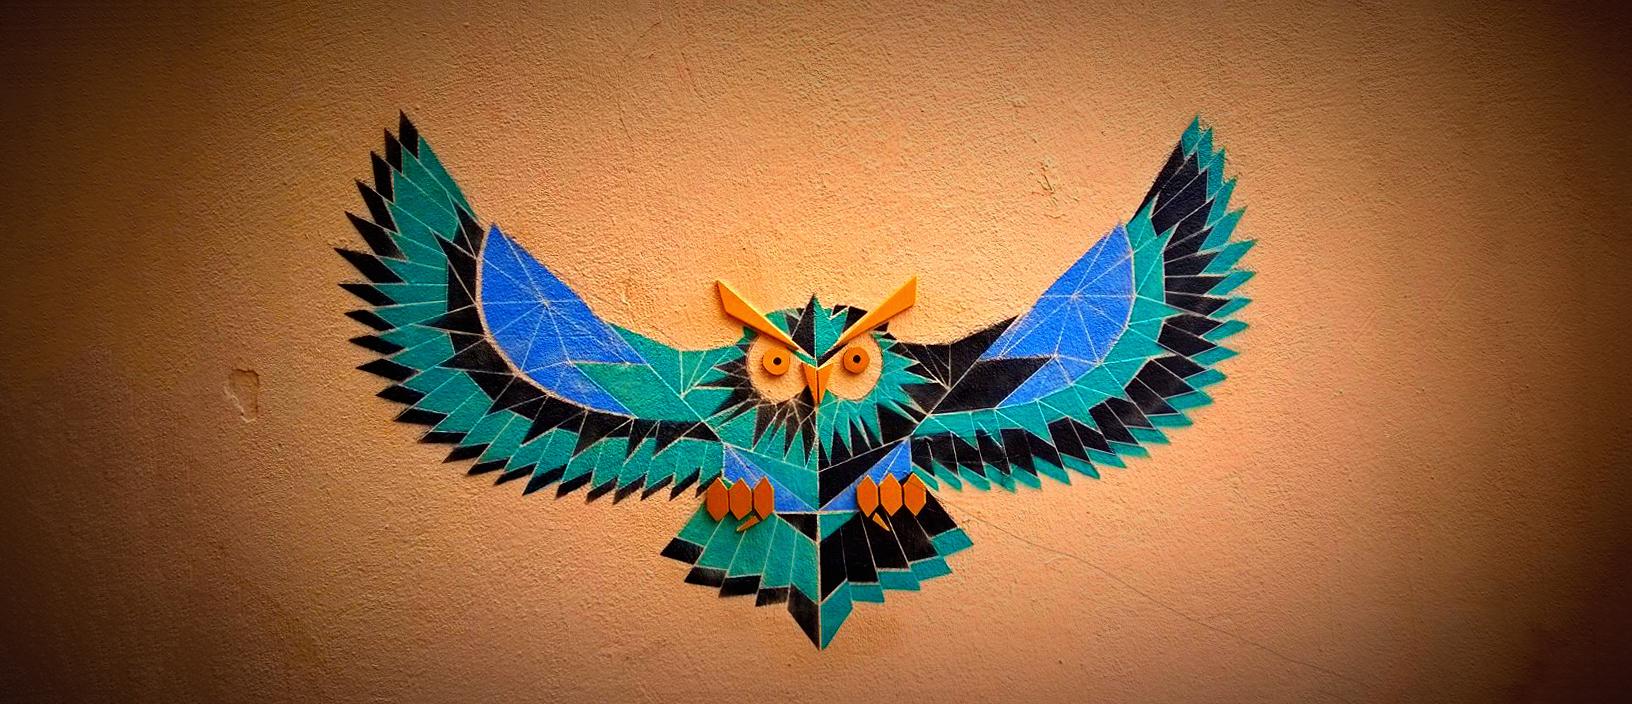 Great Owl Δ